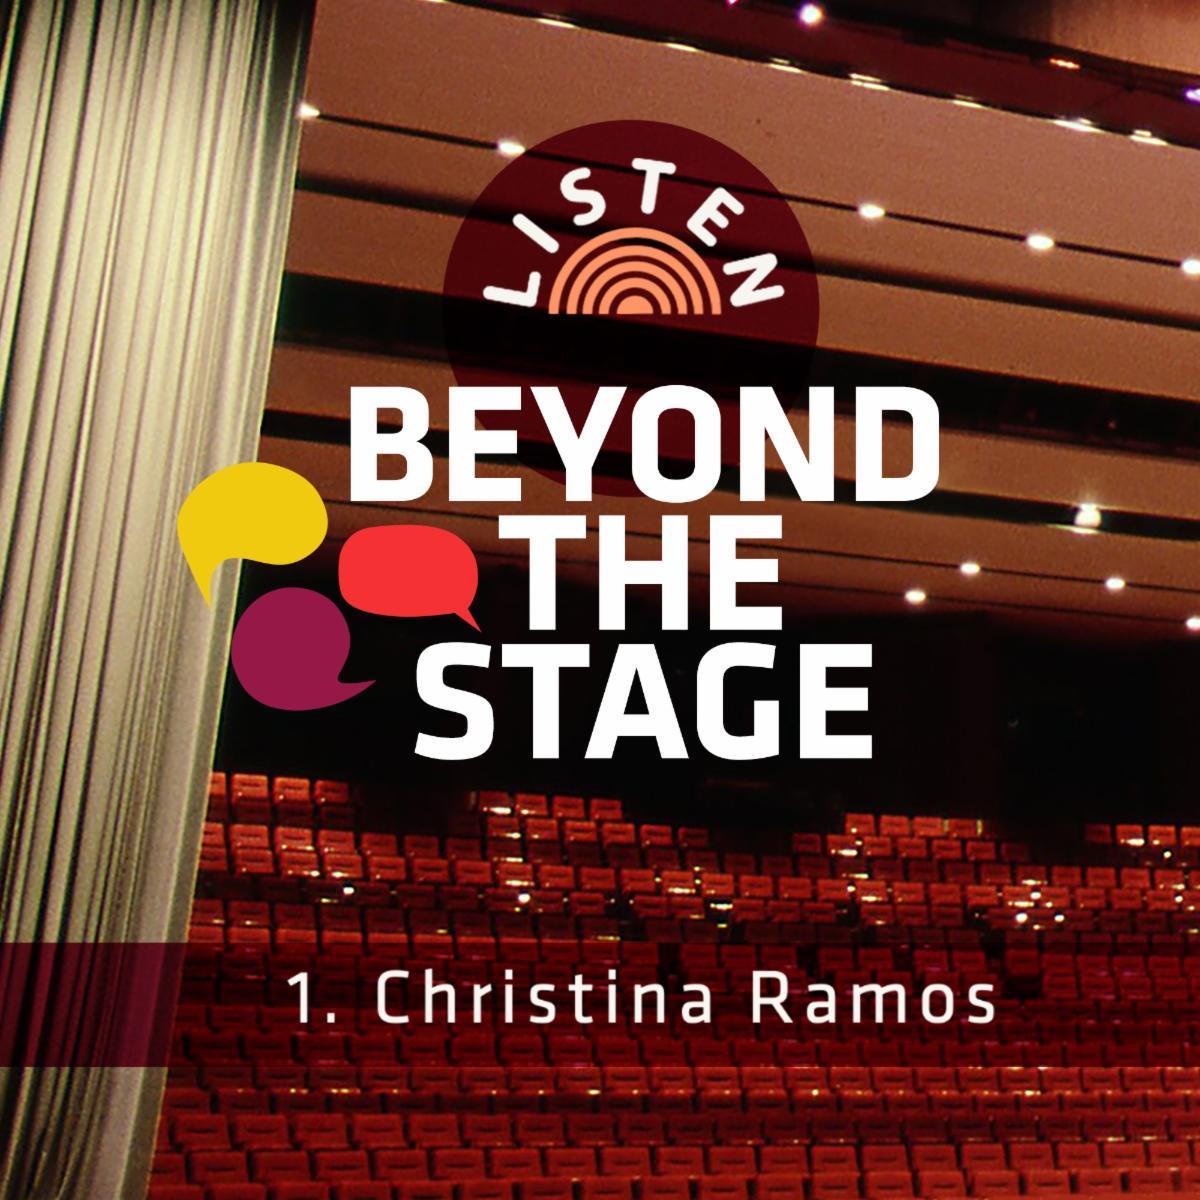 Beyond the Stage episode 1 Christina Ramos